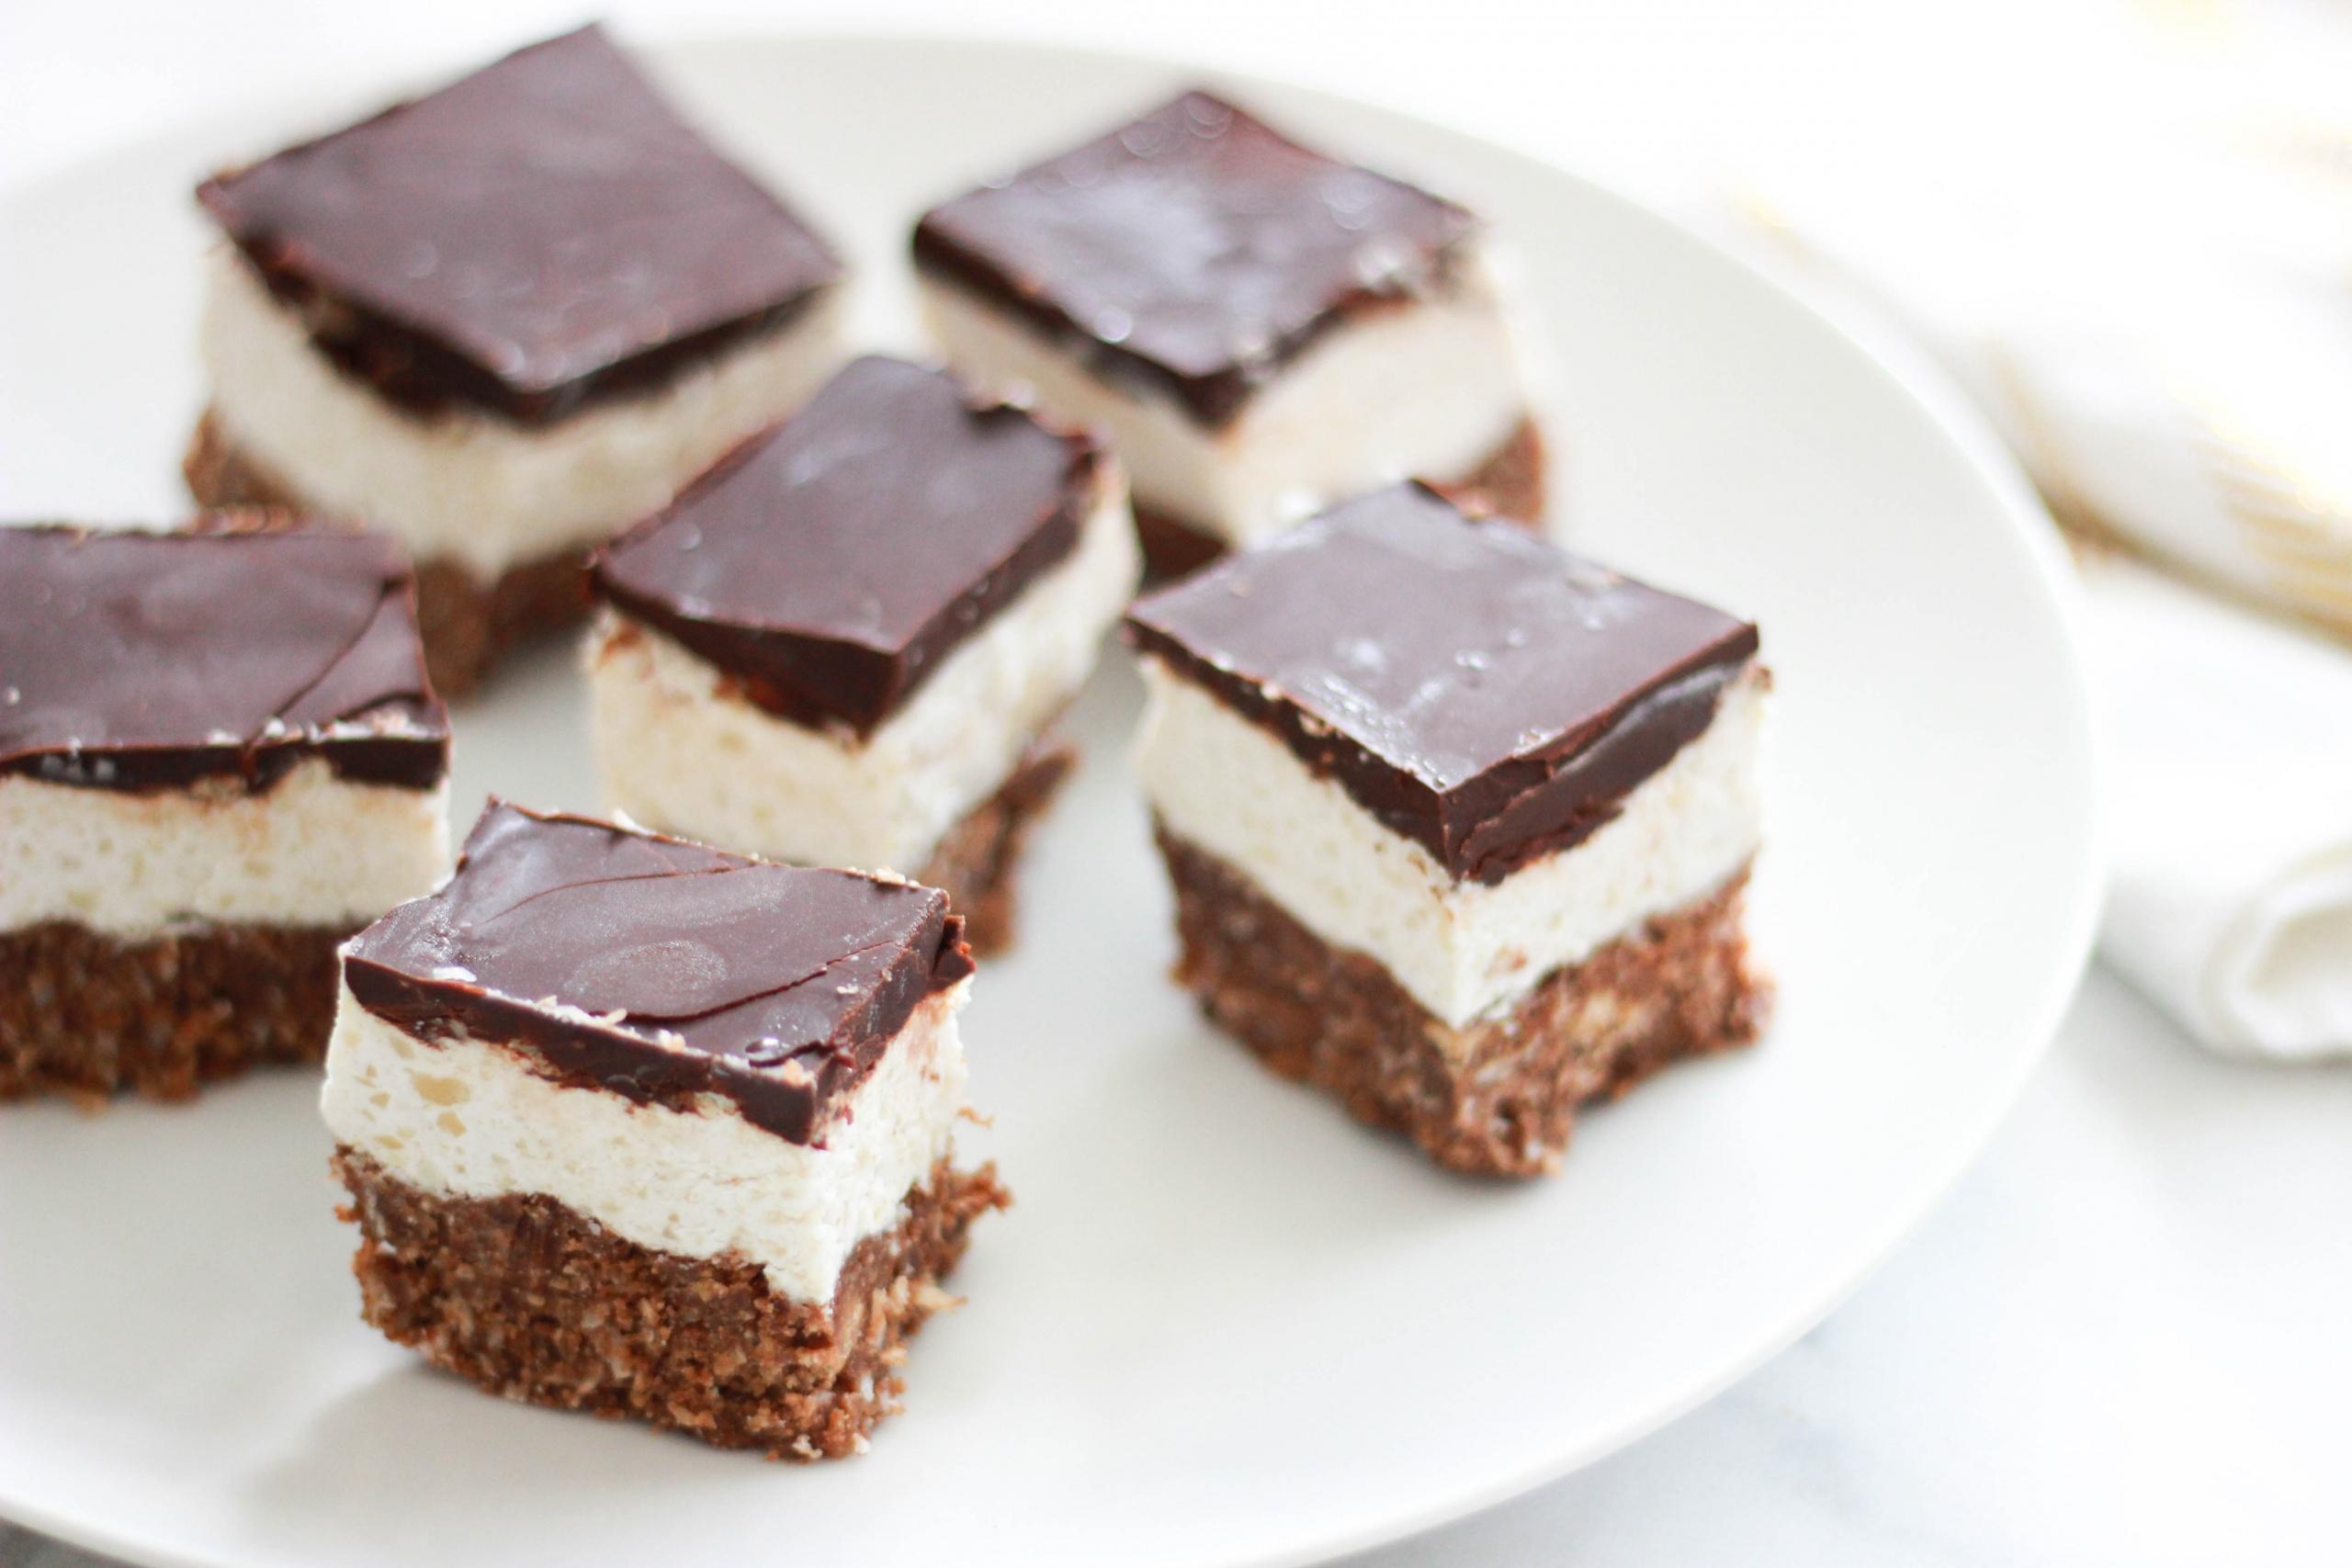 Paleo / Vegan / Sugar-Free Nanaimo Bars